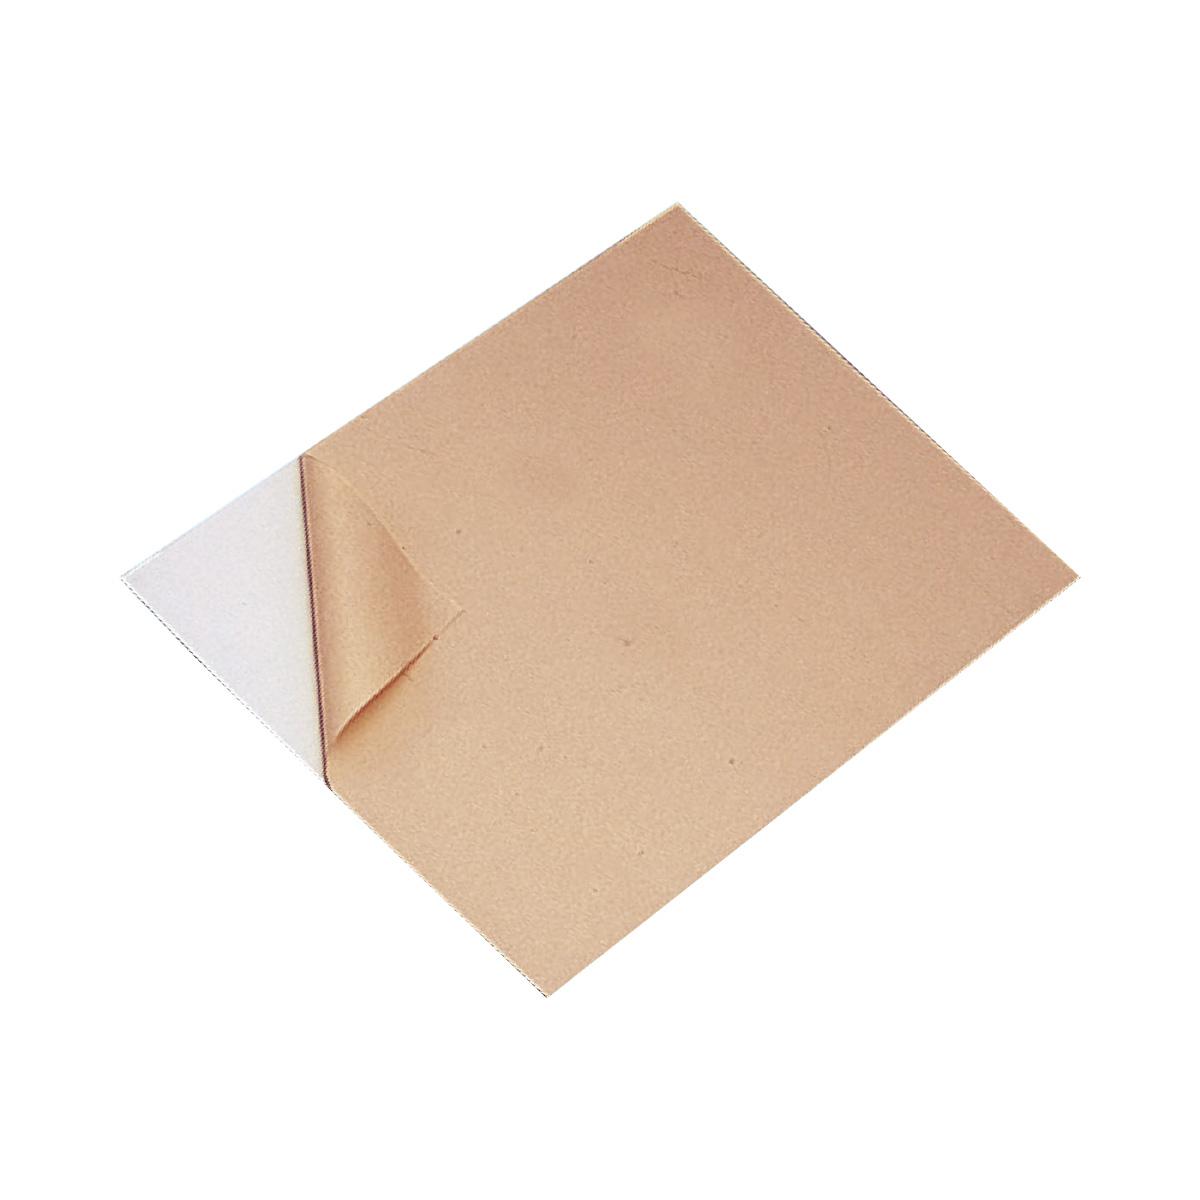 砂絵用シート 200×150mm 図工 工作 美術 画材 学校 教材 キッズ 子供 夏休み 宿題